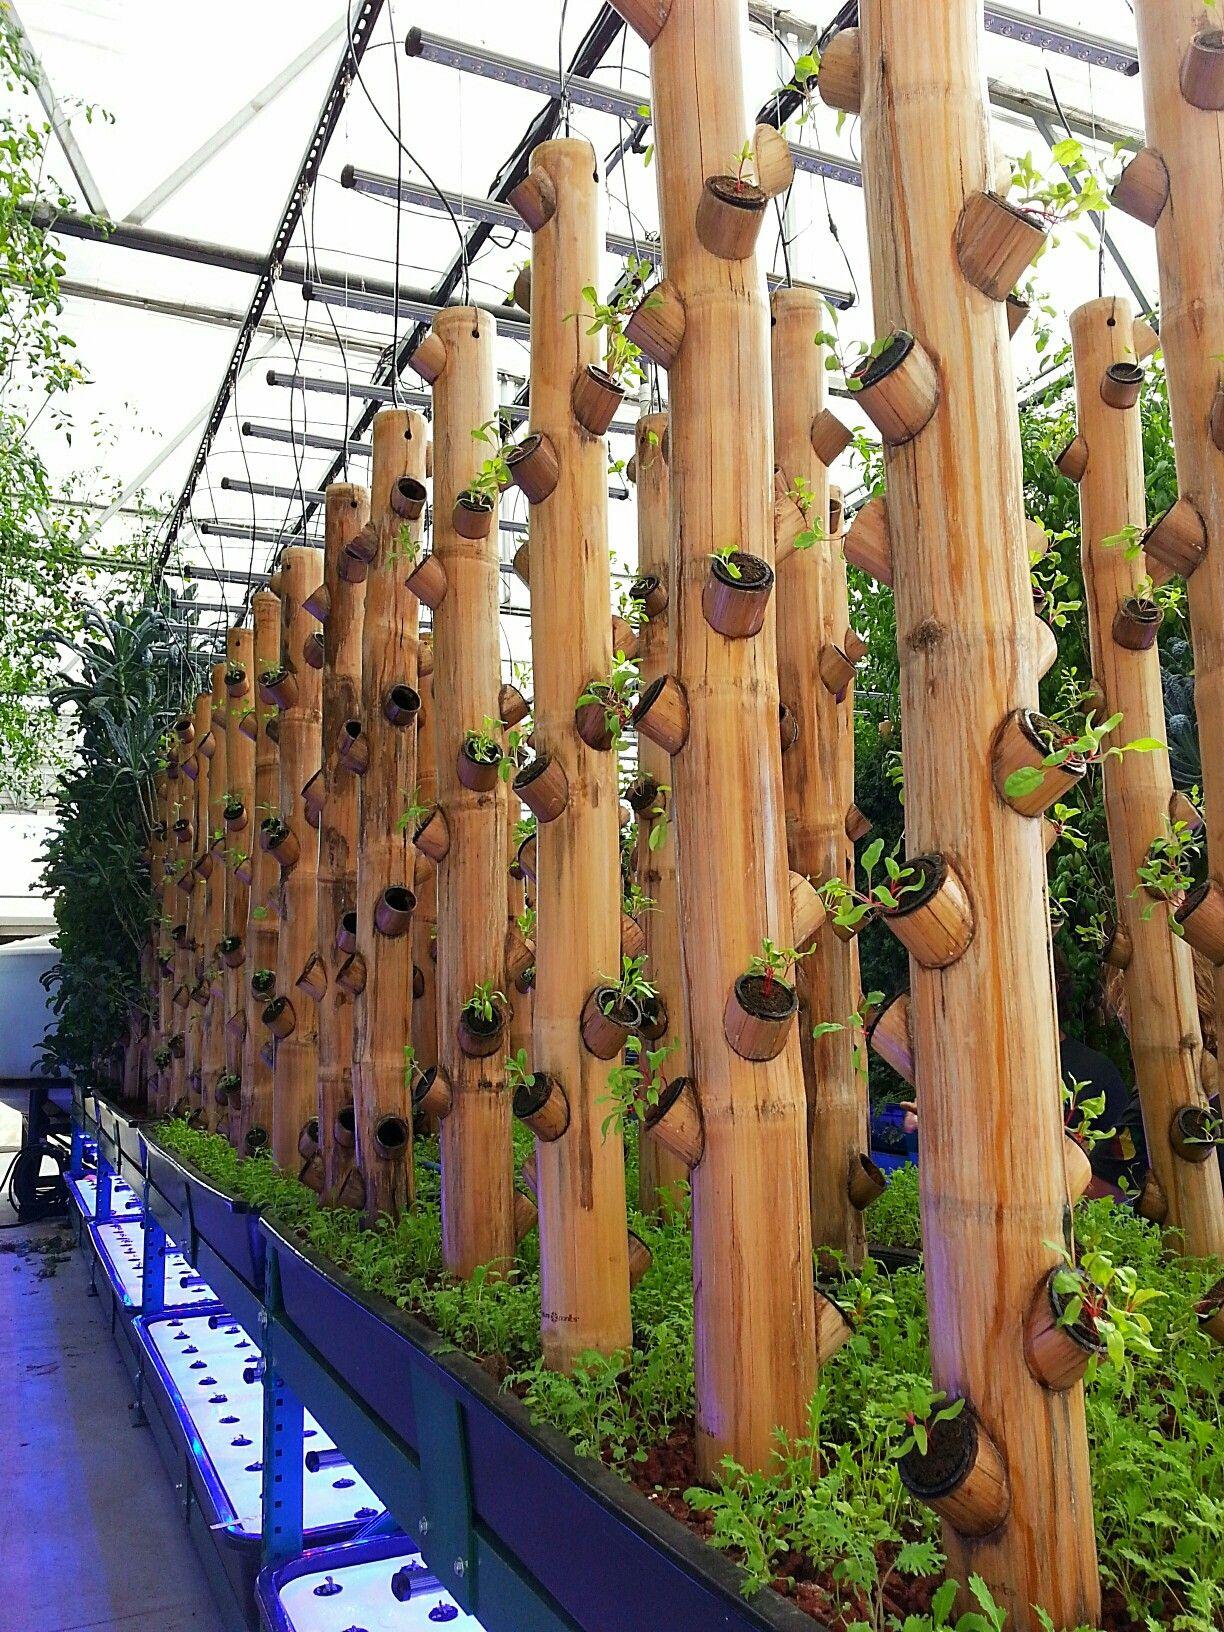 Bamboo Gardening Greenhouse … | Agriculture Urbaine ... tout Serre De Jardin Amazon